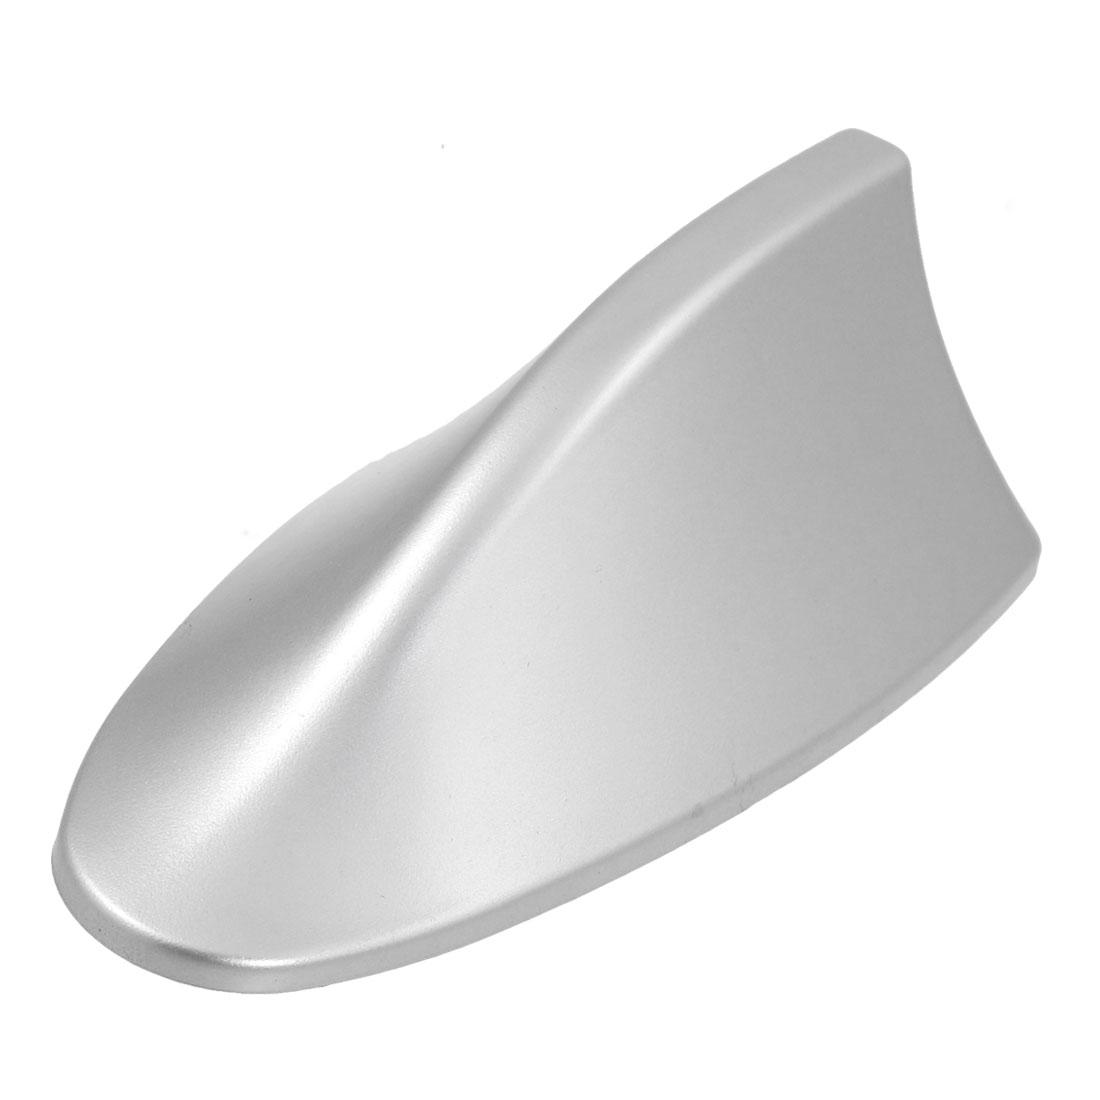 Auto Car Silver Tone Shark Fin Shape Adhesive Antenna Decoration